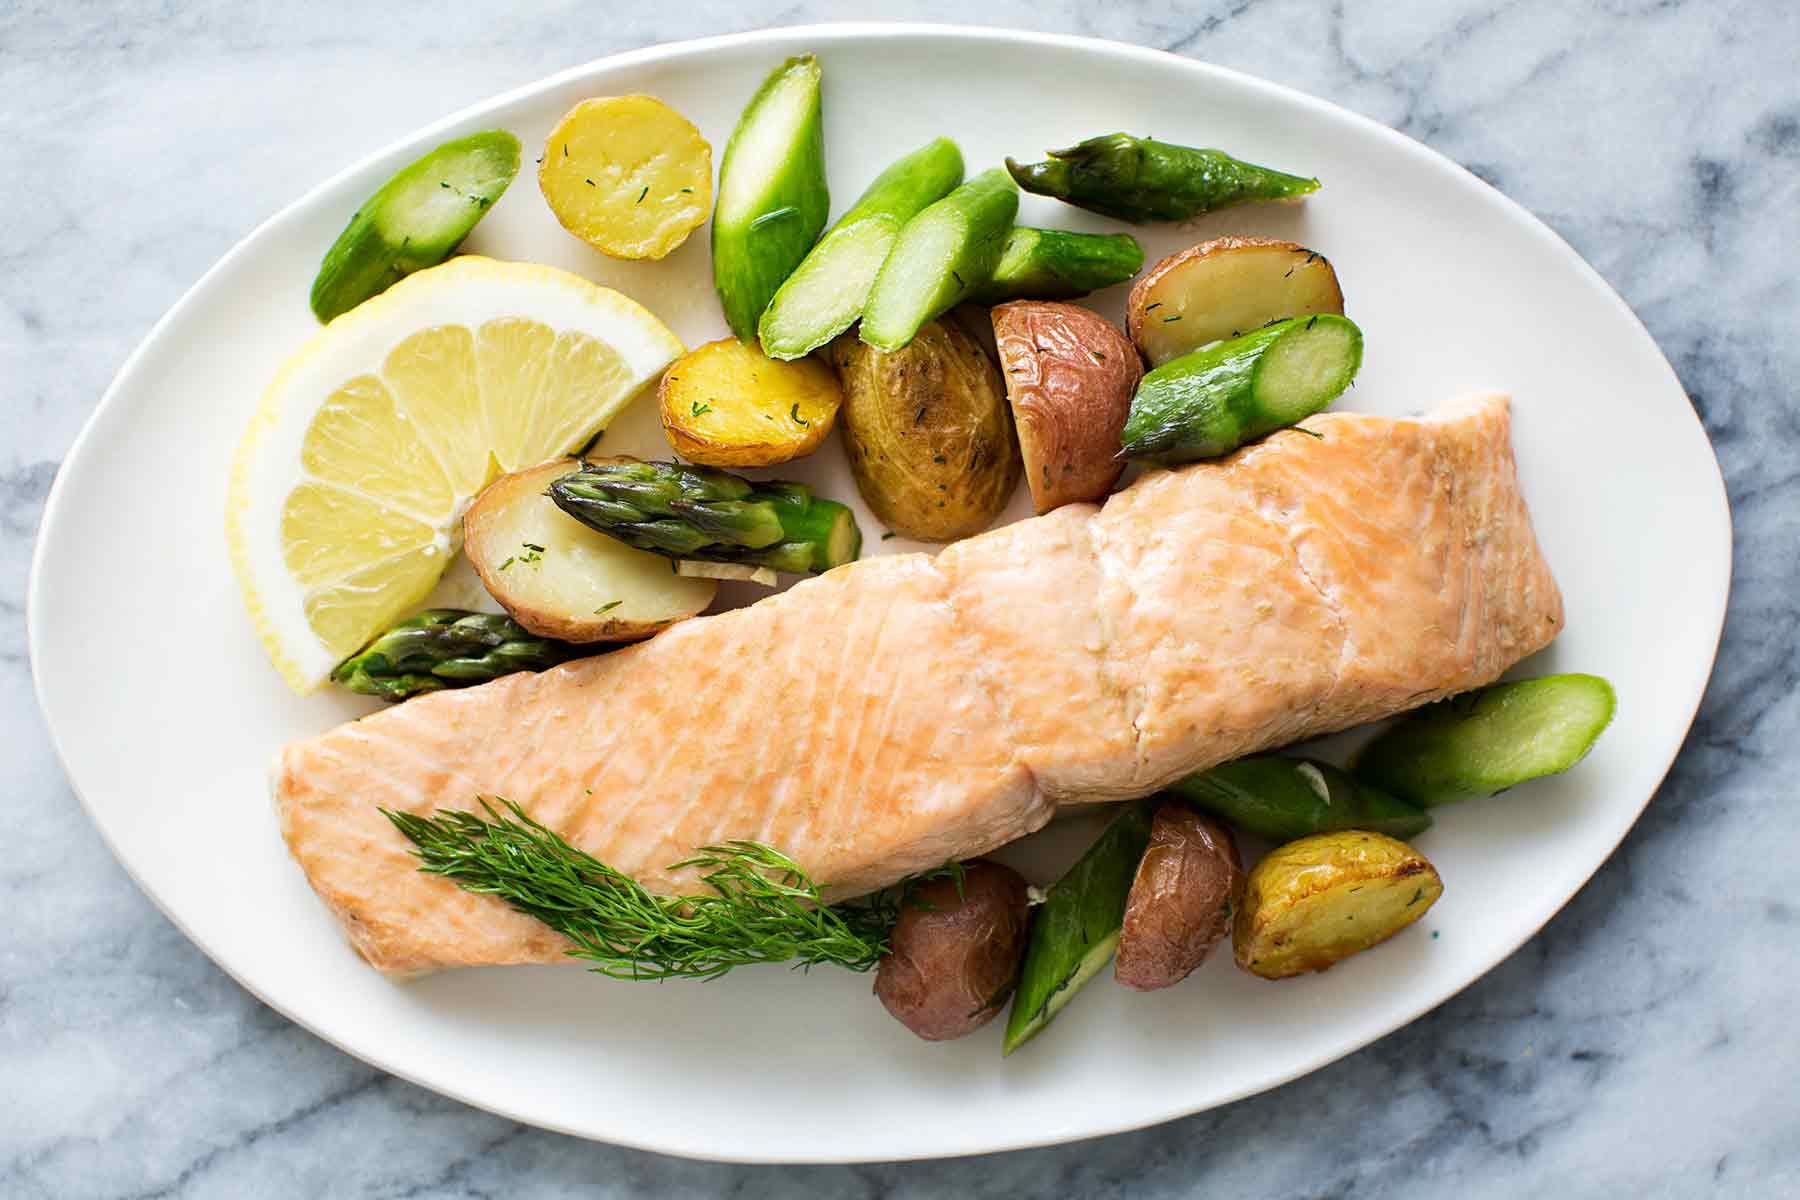 New Potato Recipe  Oven Roasted Salmon Asparagus and New Potatoes Recipe